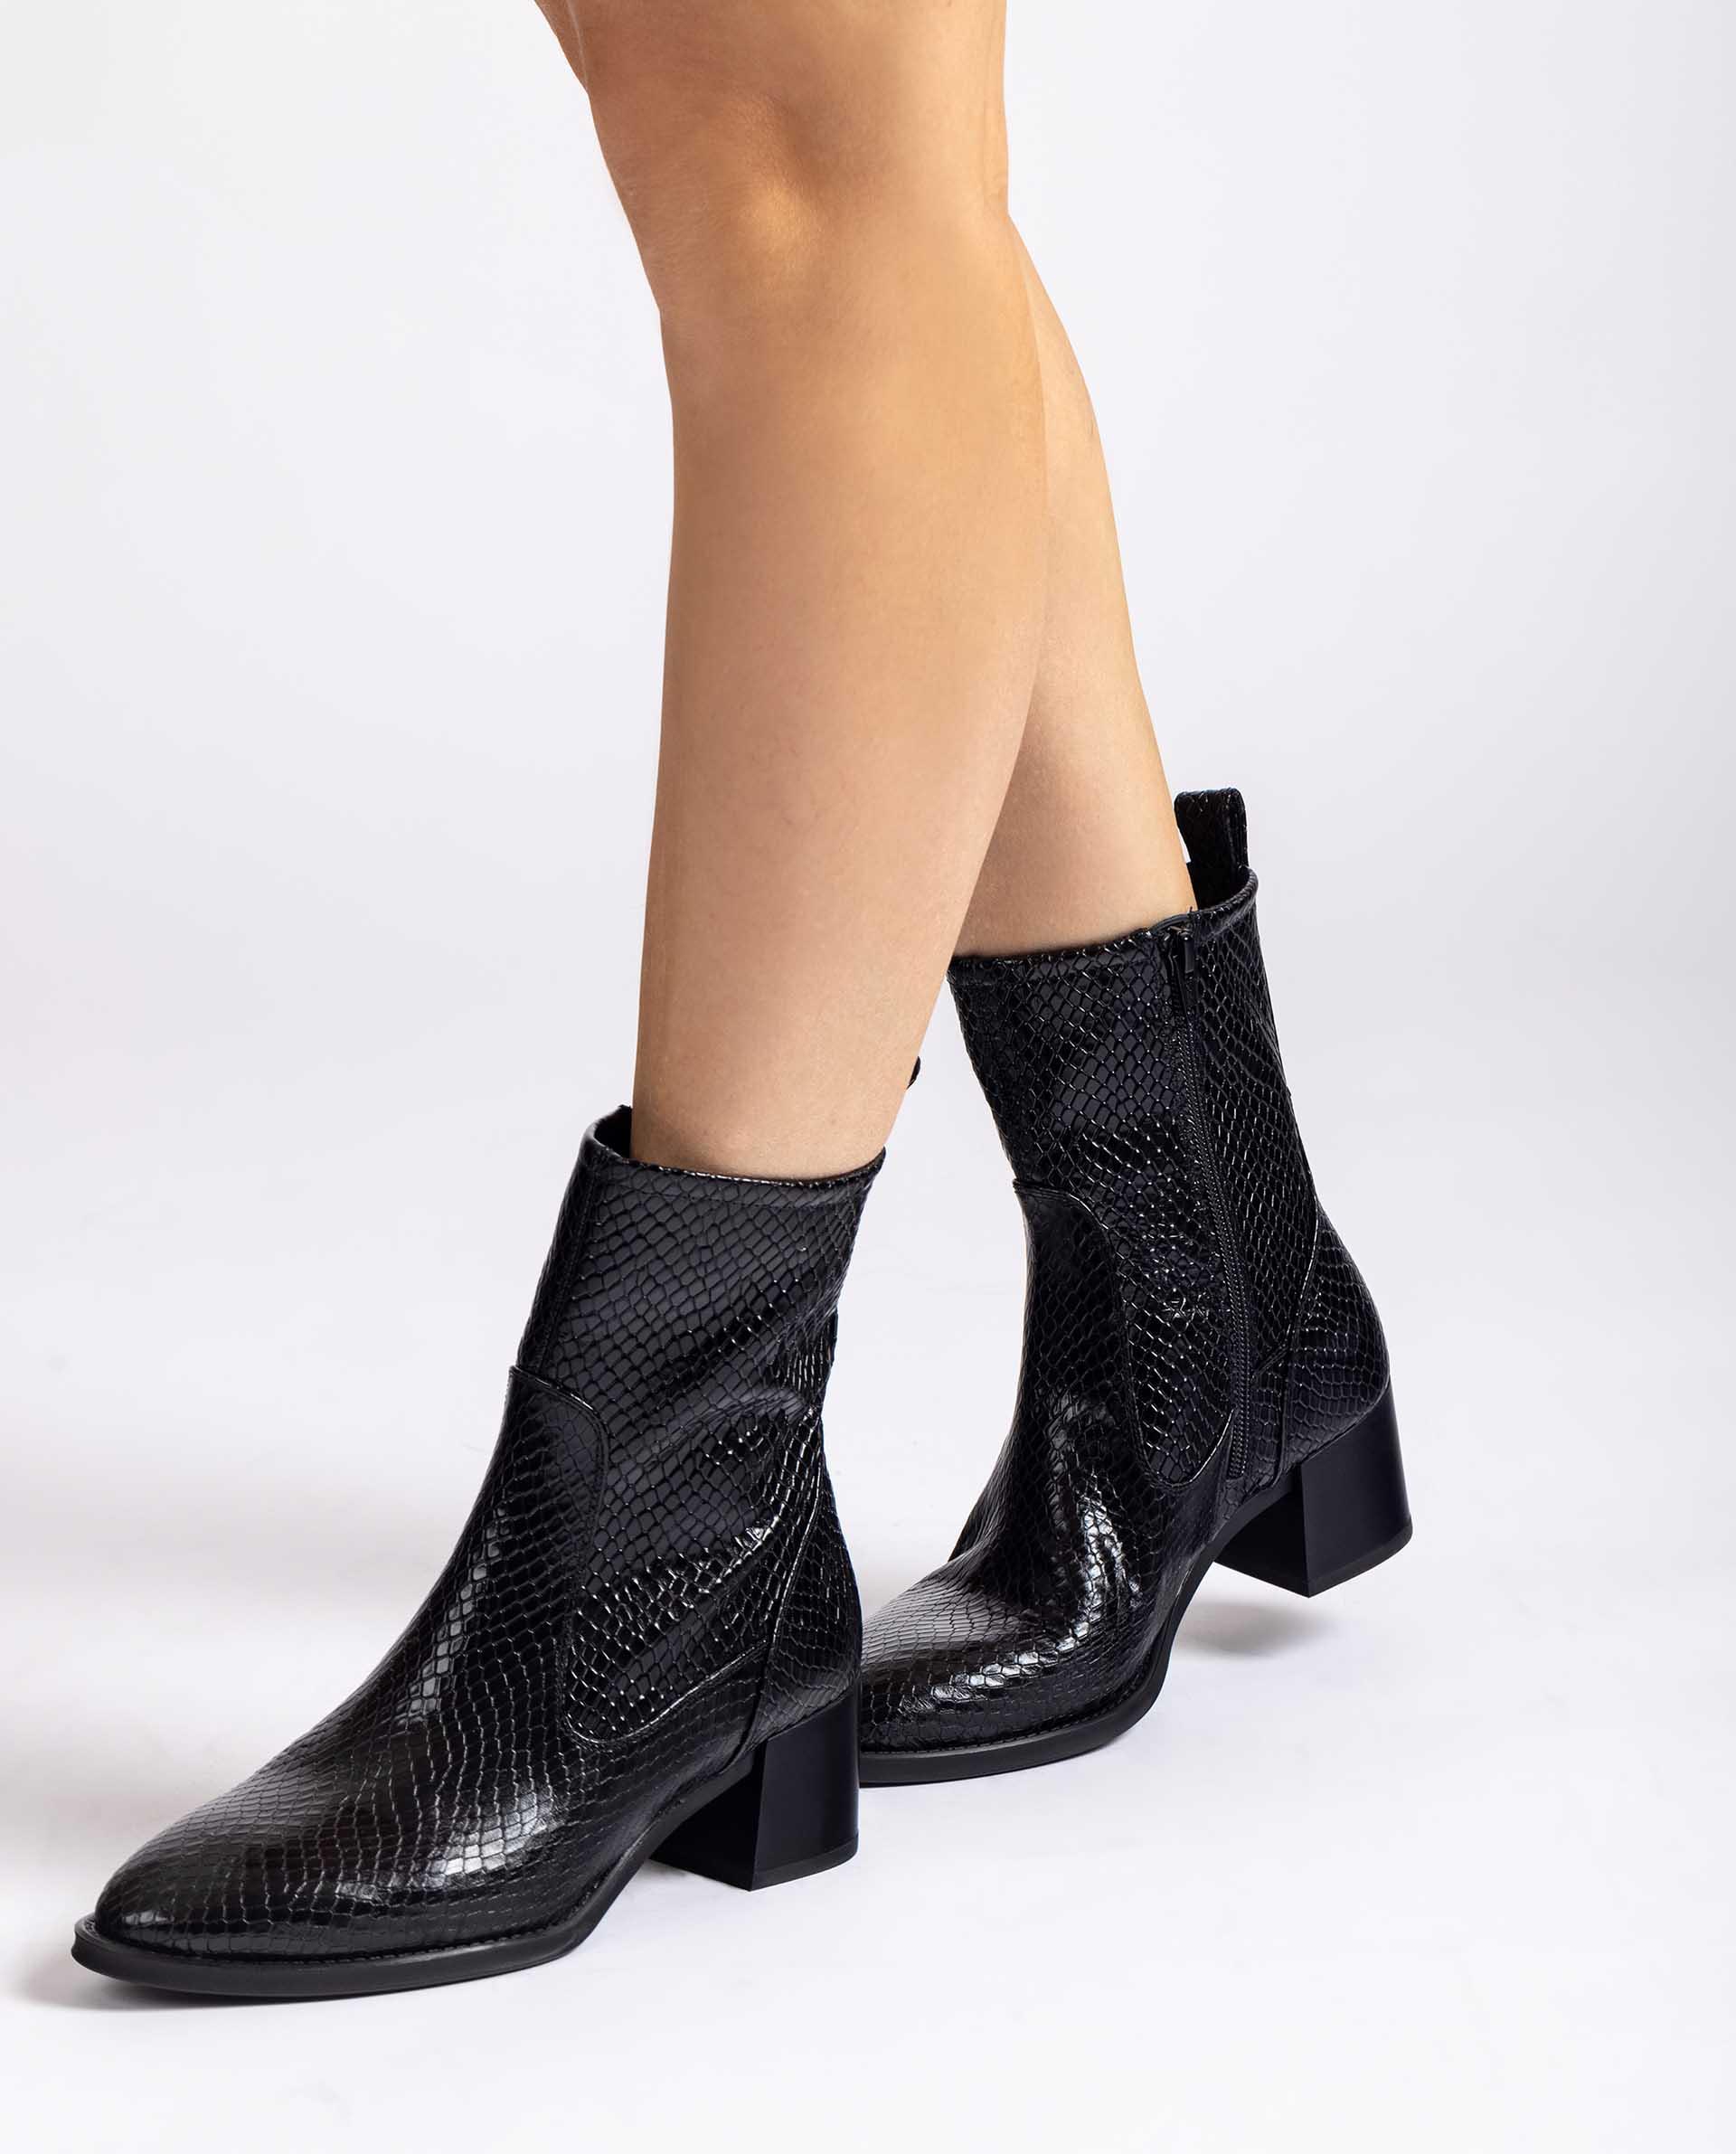 UNISA Stiefeletten im Cowboy-Stil aus geprägtem Leder MUNAY_DJA 5